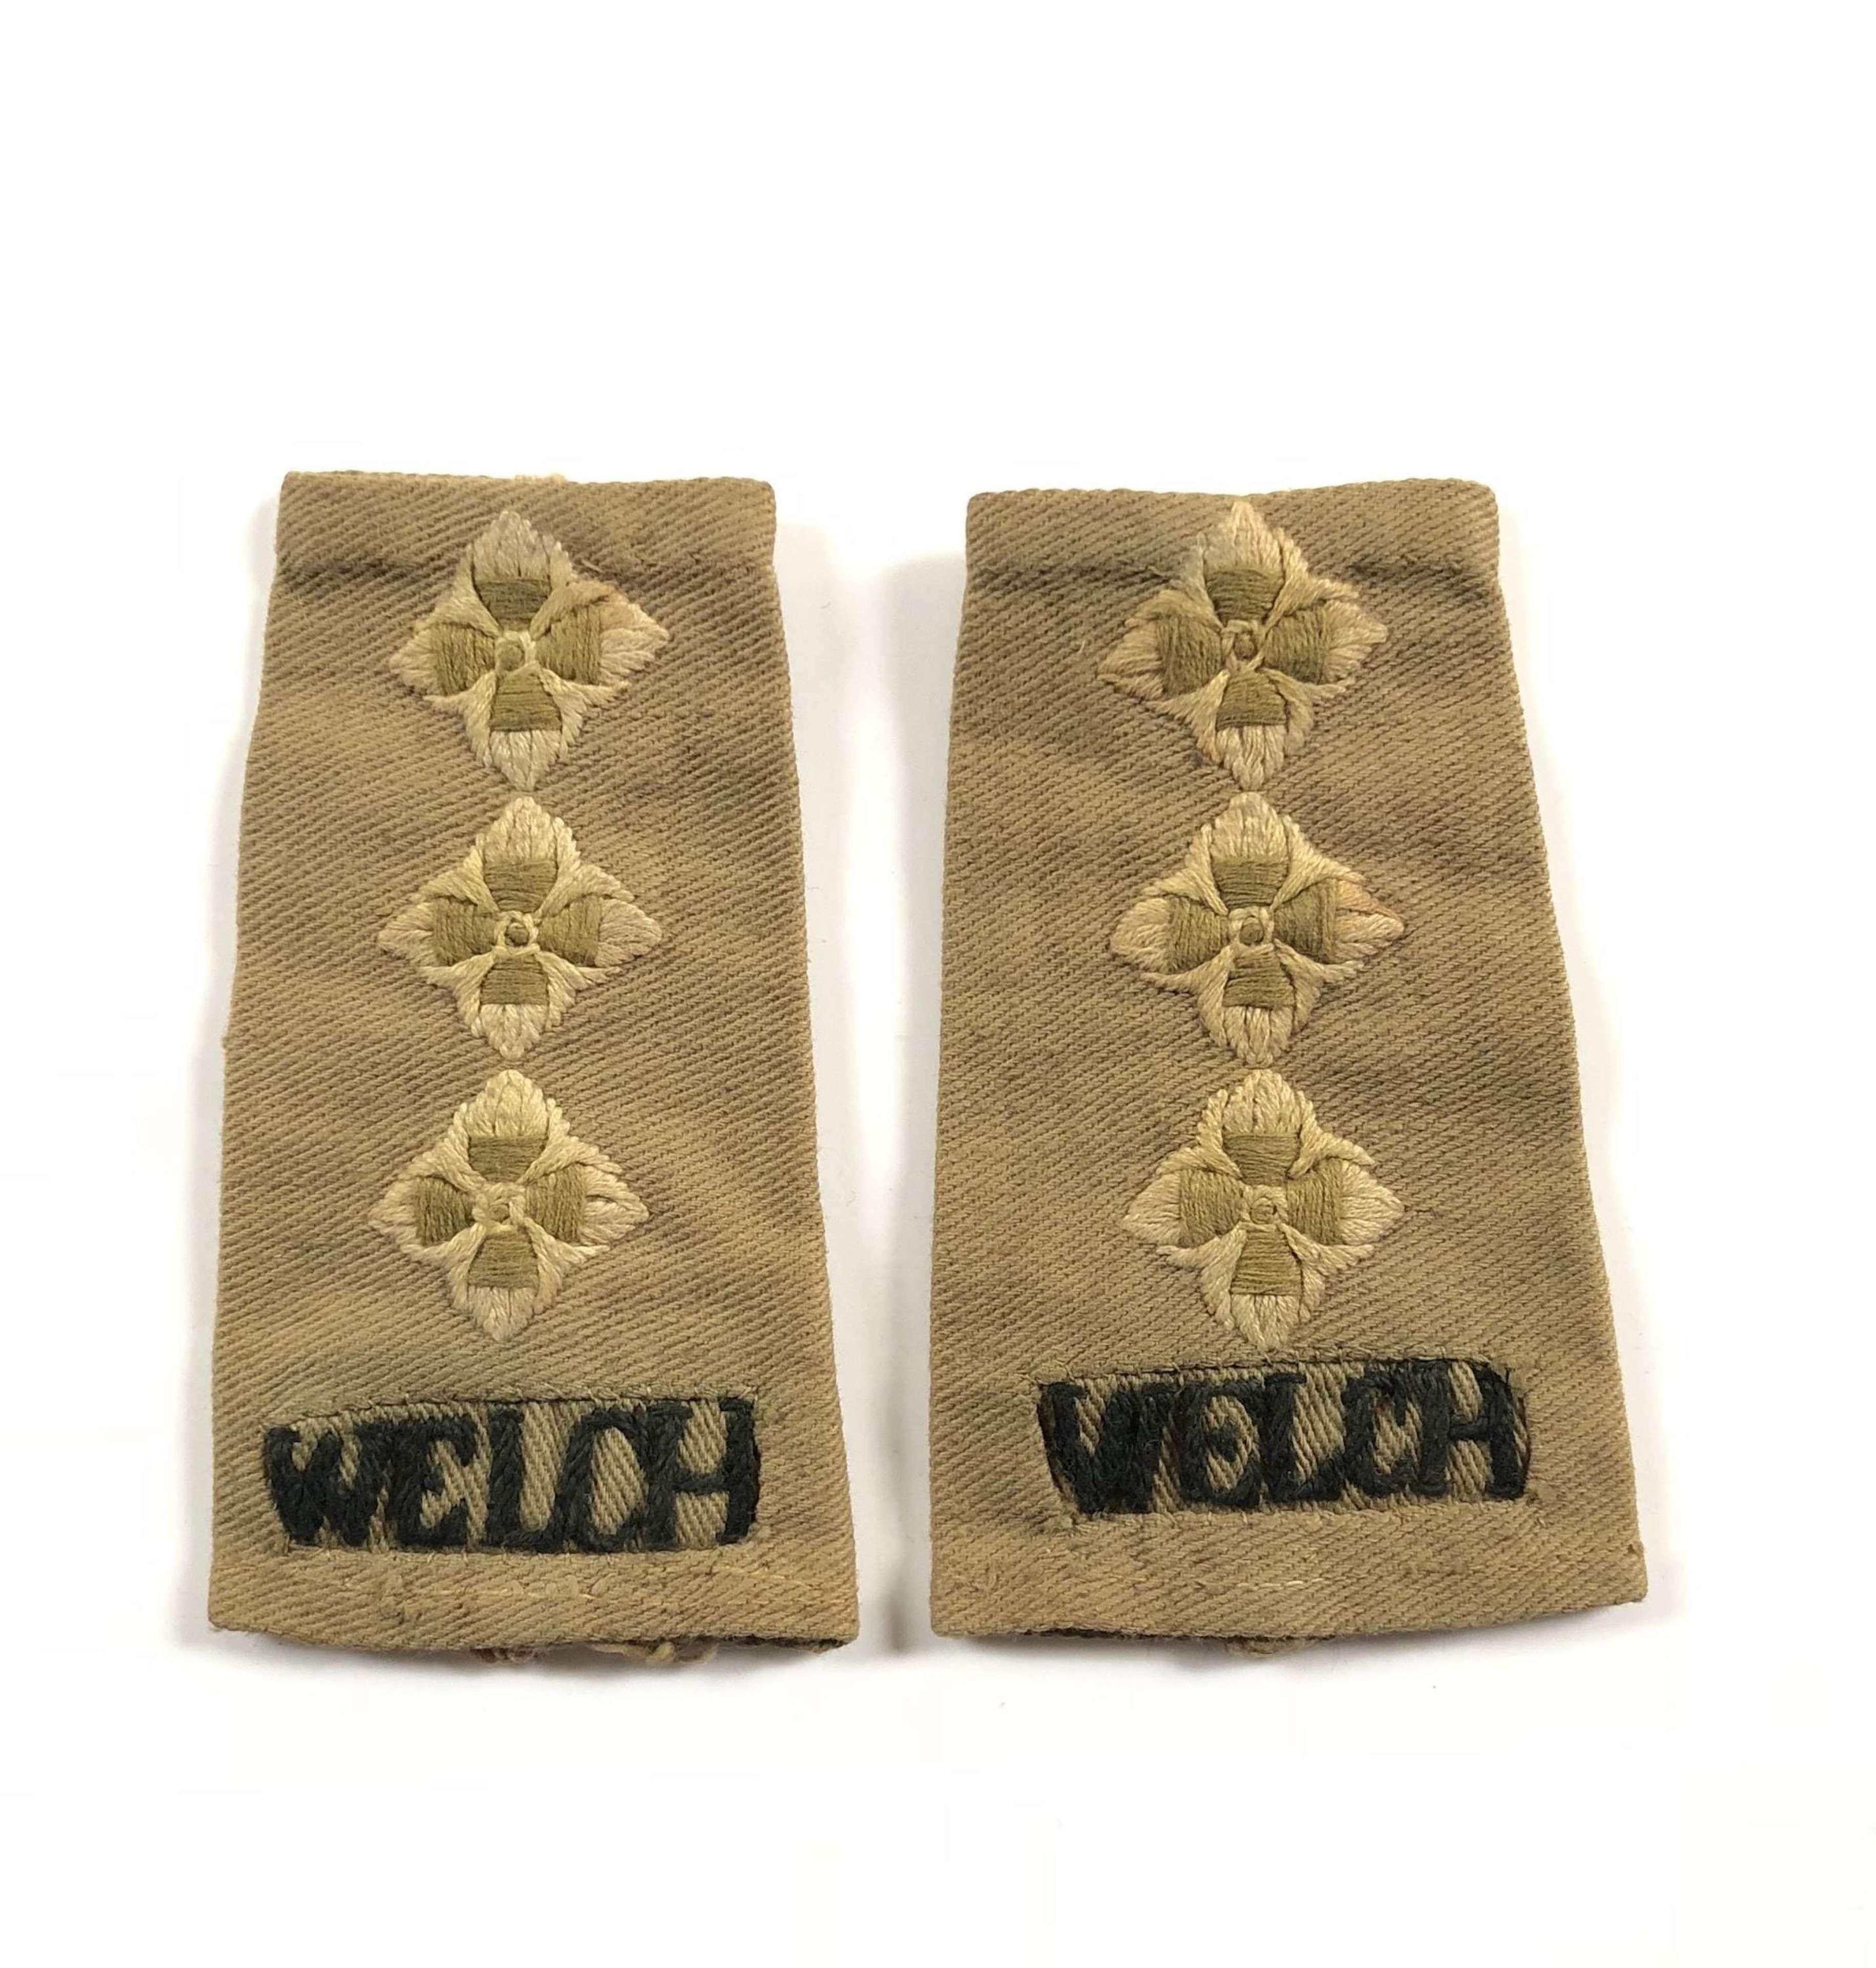 WW2 Welch Regiment KD Captain Rank Slip On Rank.